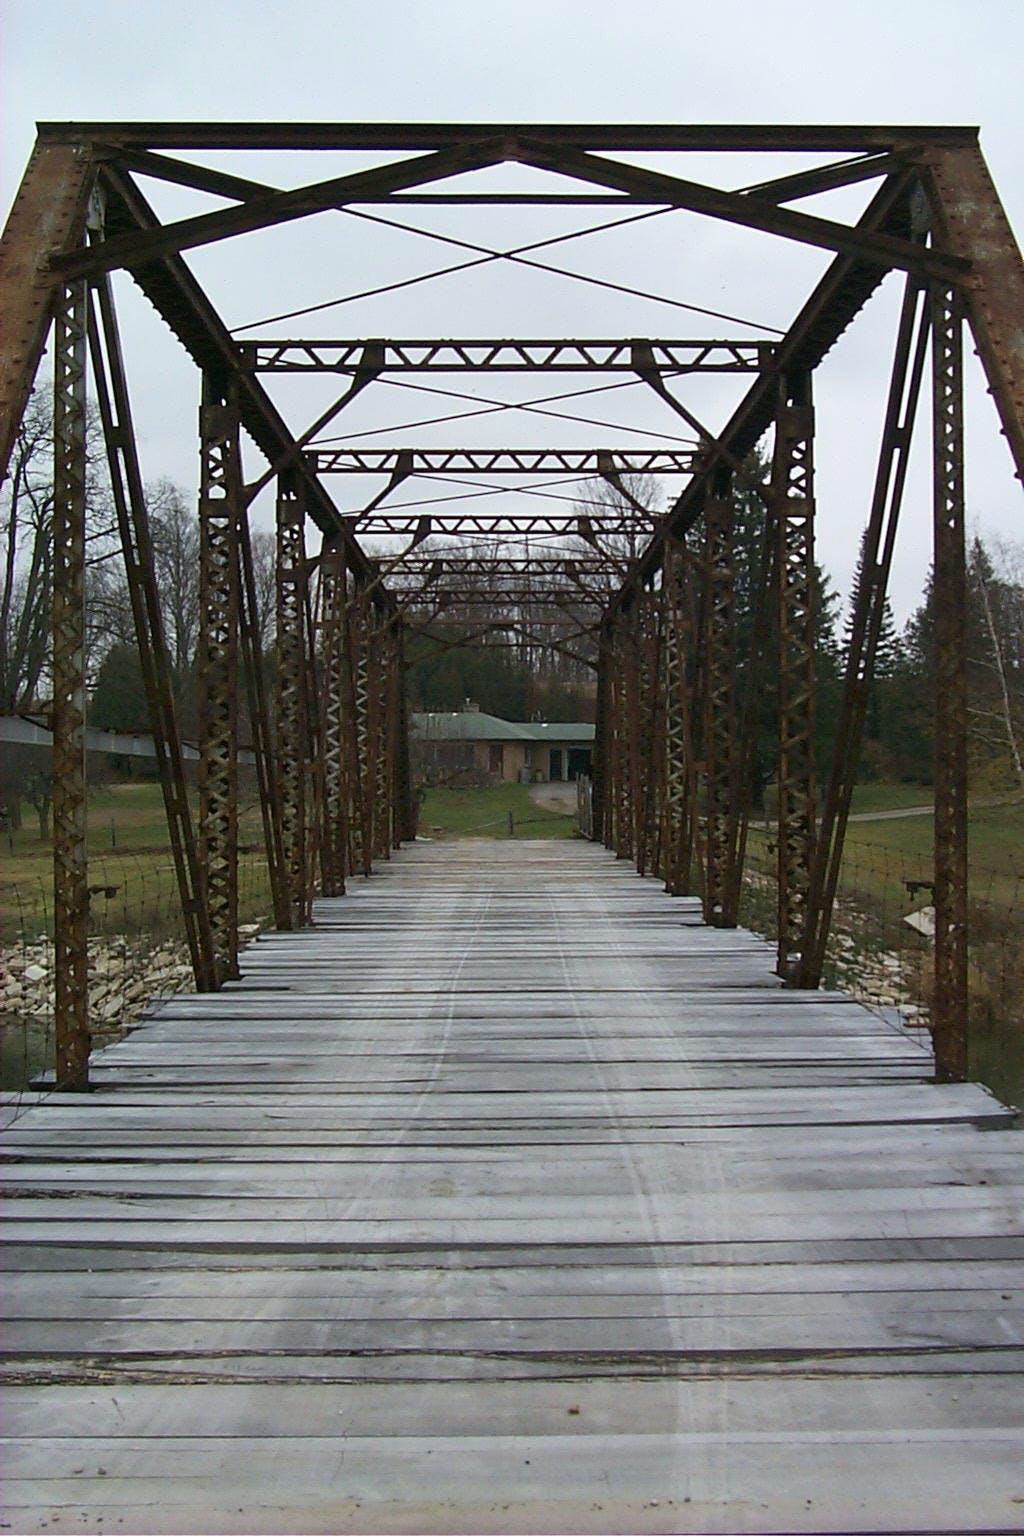 Stanley Piper Street Steel Truss Bridge